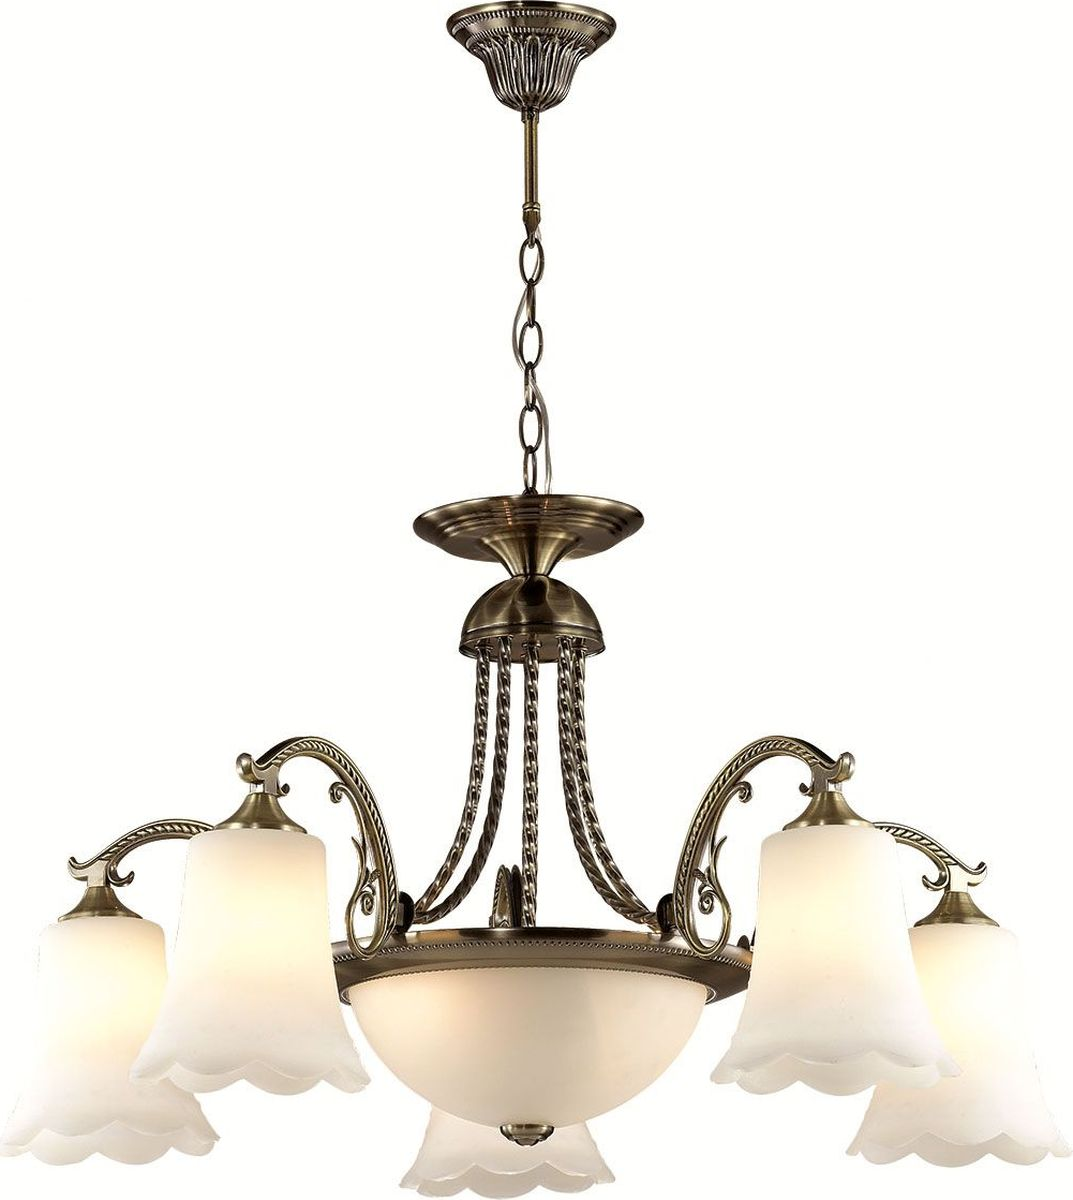 Люстра подвесная Lumion Sonette, цвет: белый, E27, 60 Вт. 2985/7A2985/7A